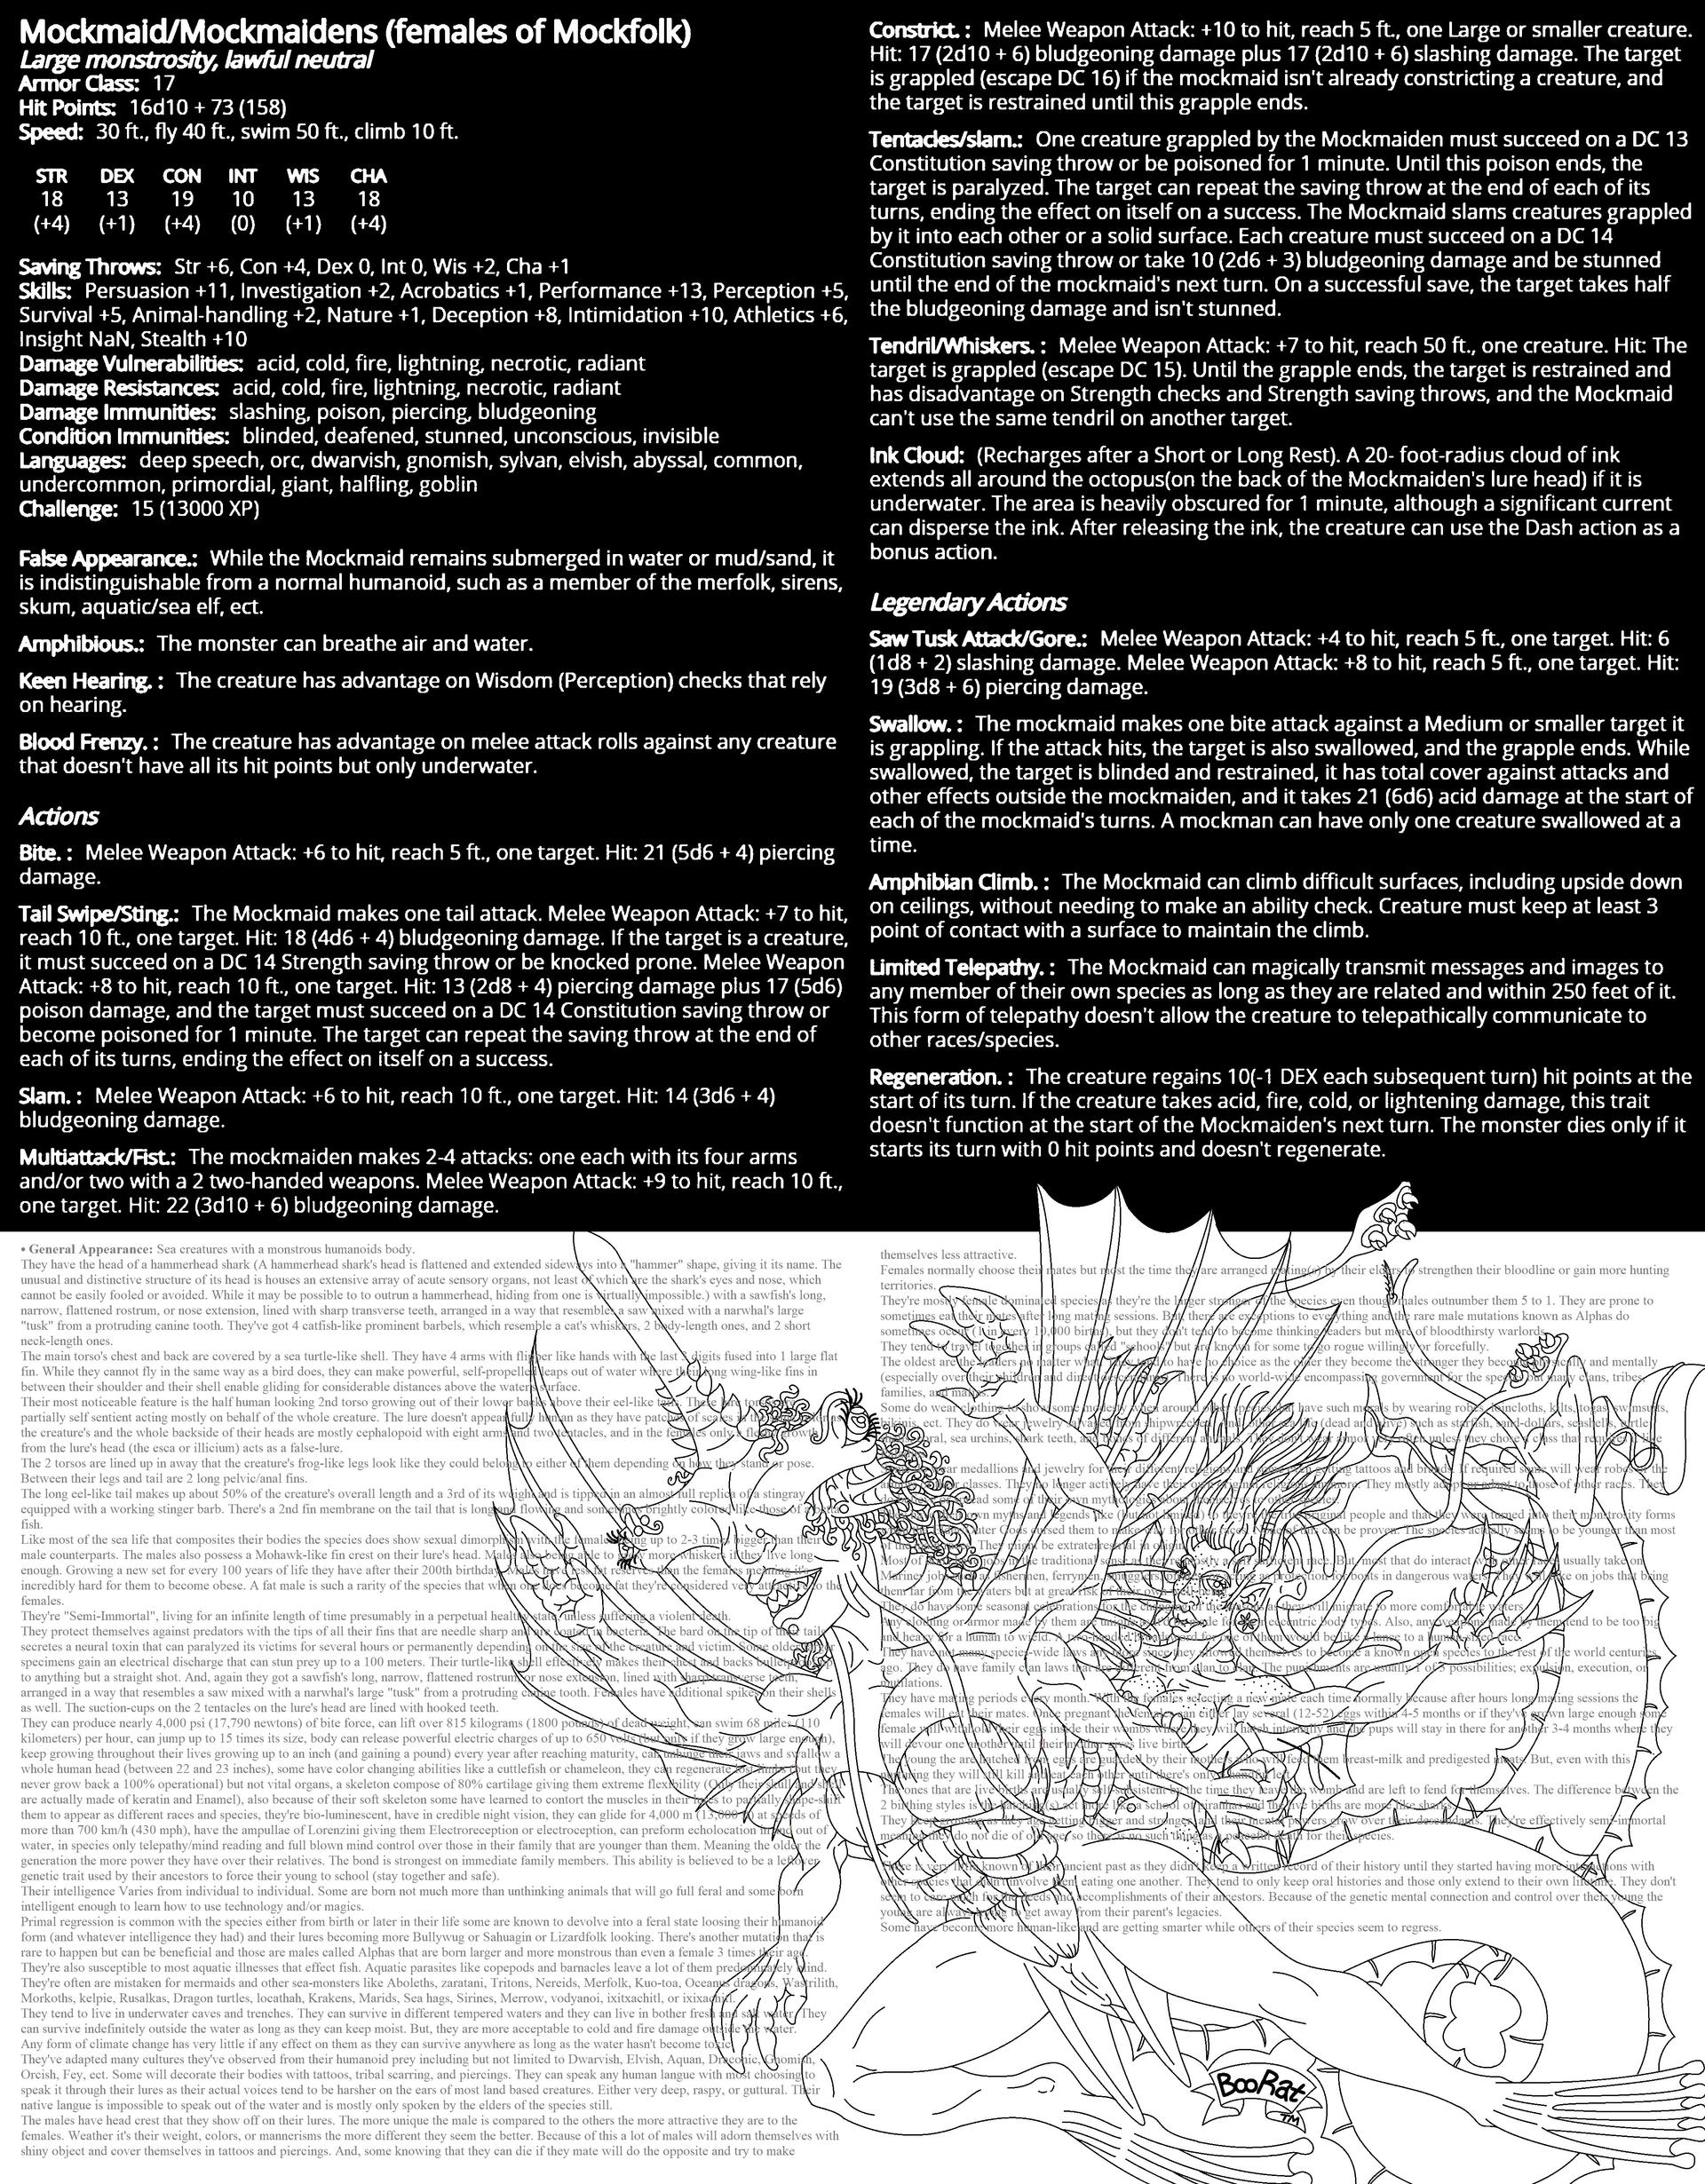 Mockmaid DnD Monster stat sheet by BooRat on DeviantArt